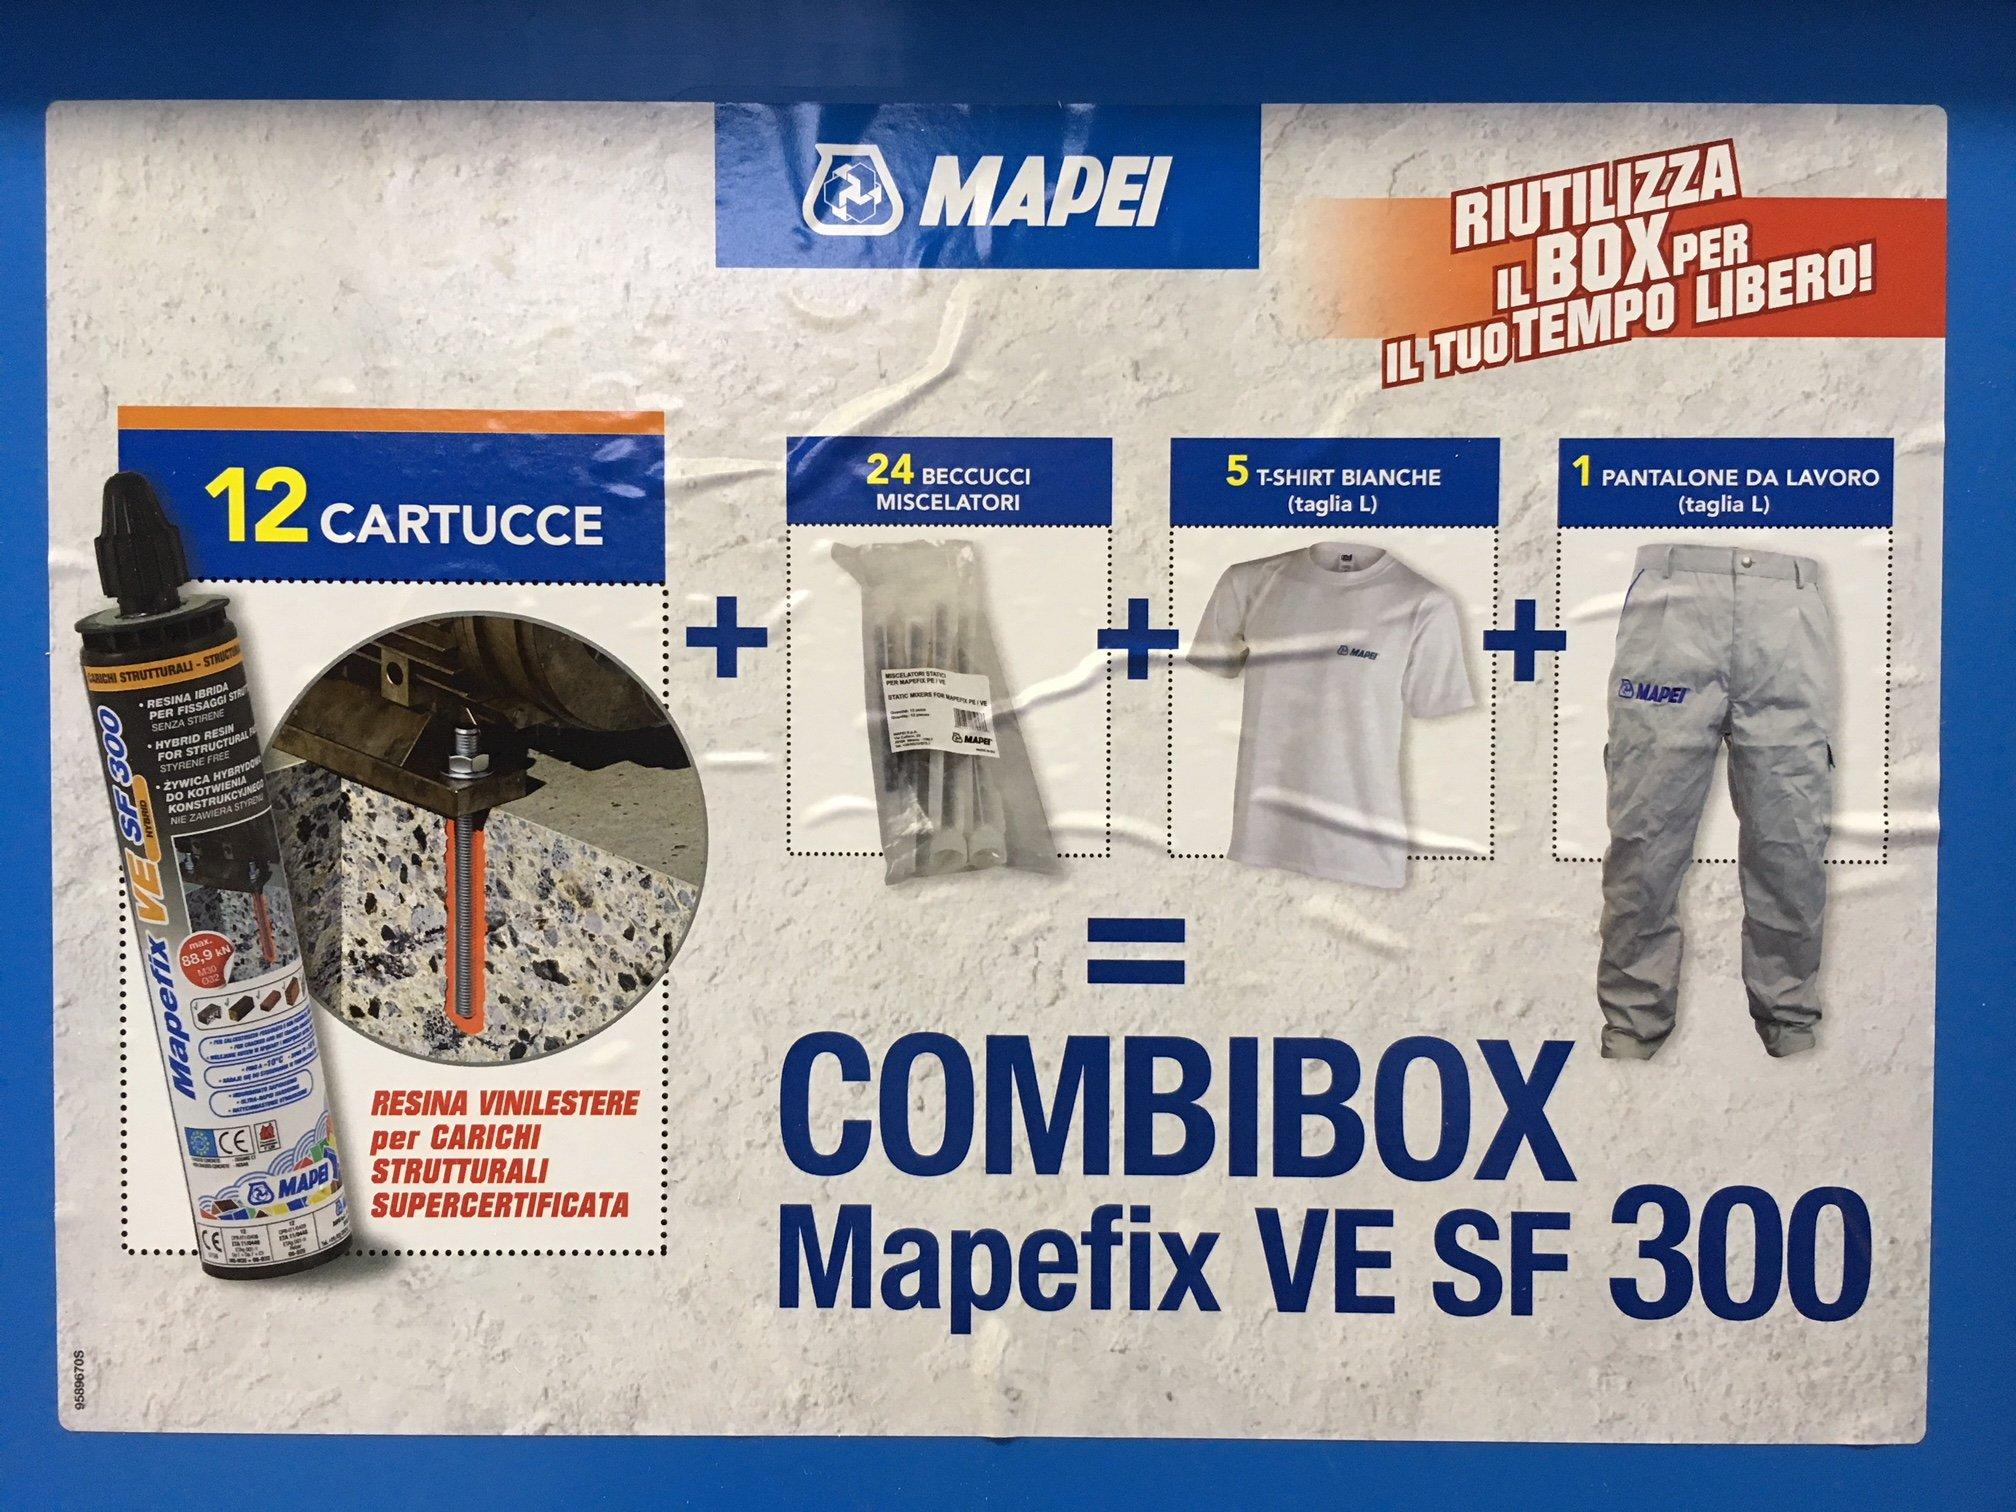 Combibox 1